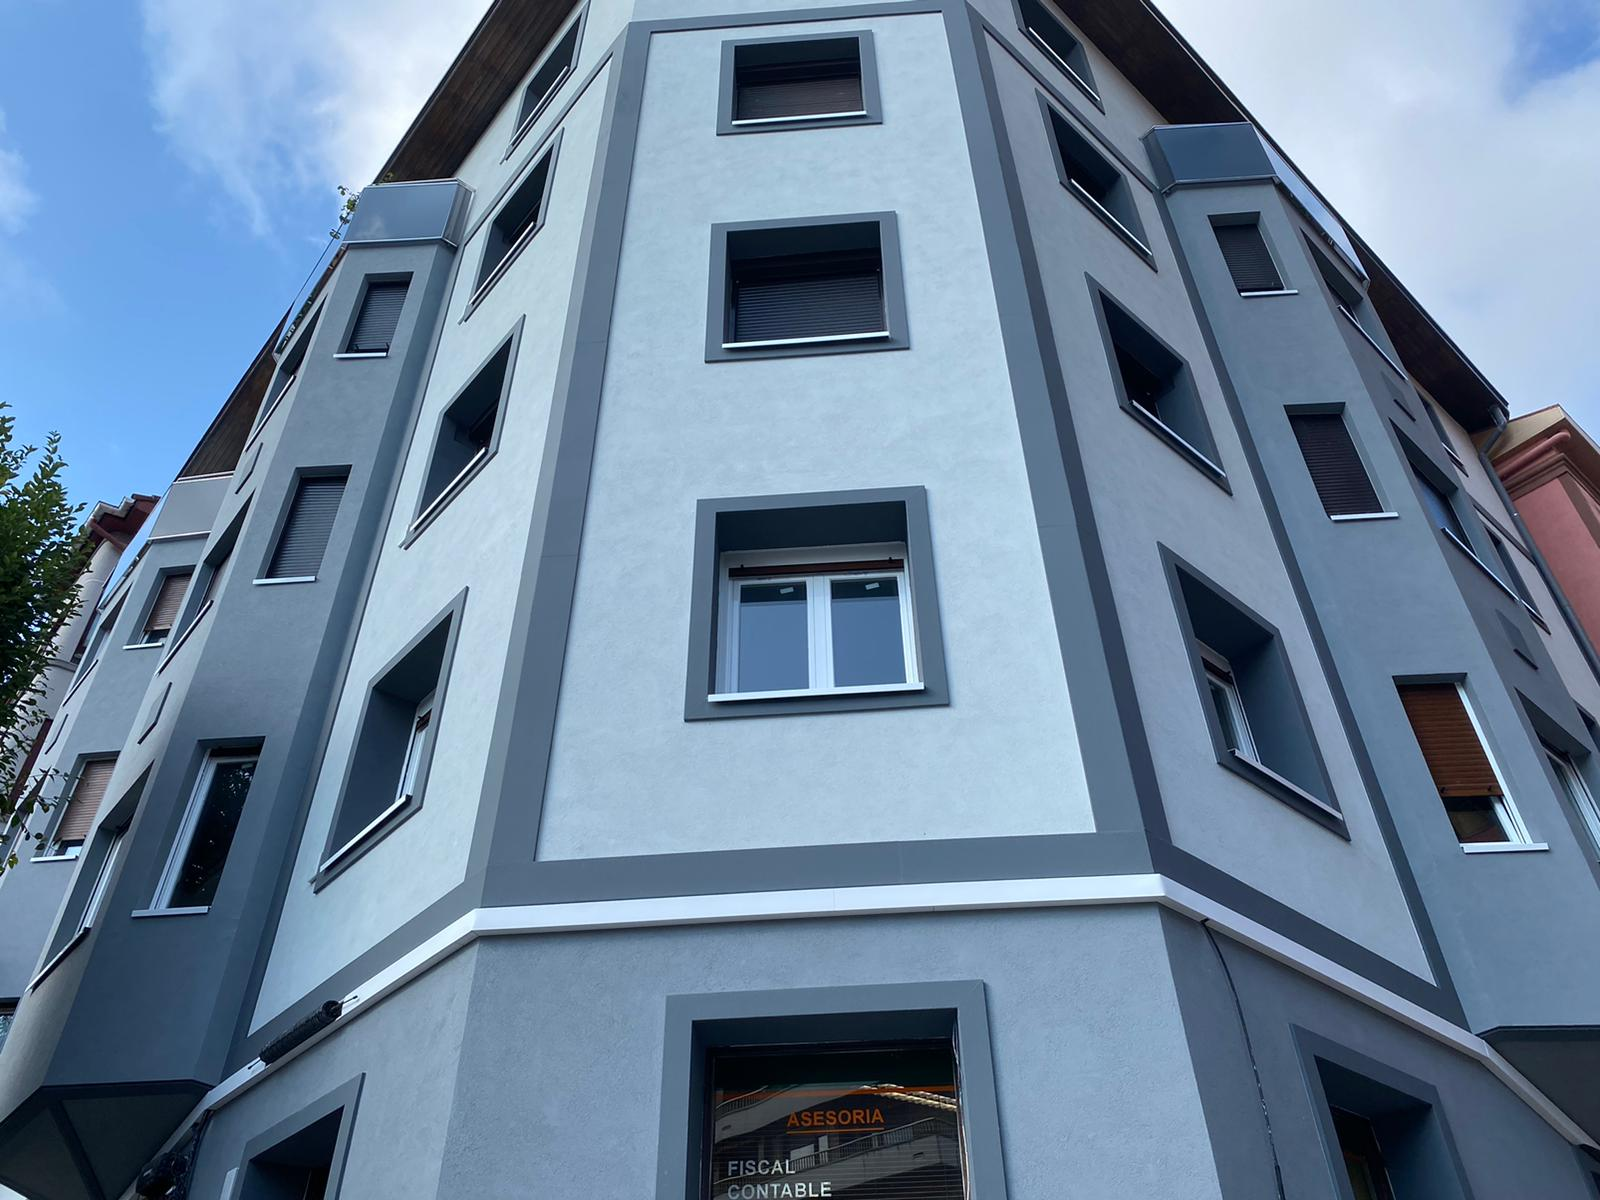 Ven a conocer esta vivienda a reformar en pleno centro de Irun!!!!